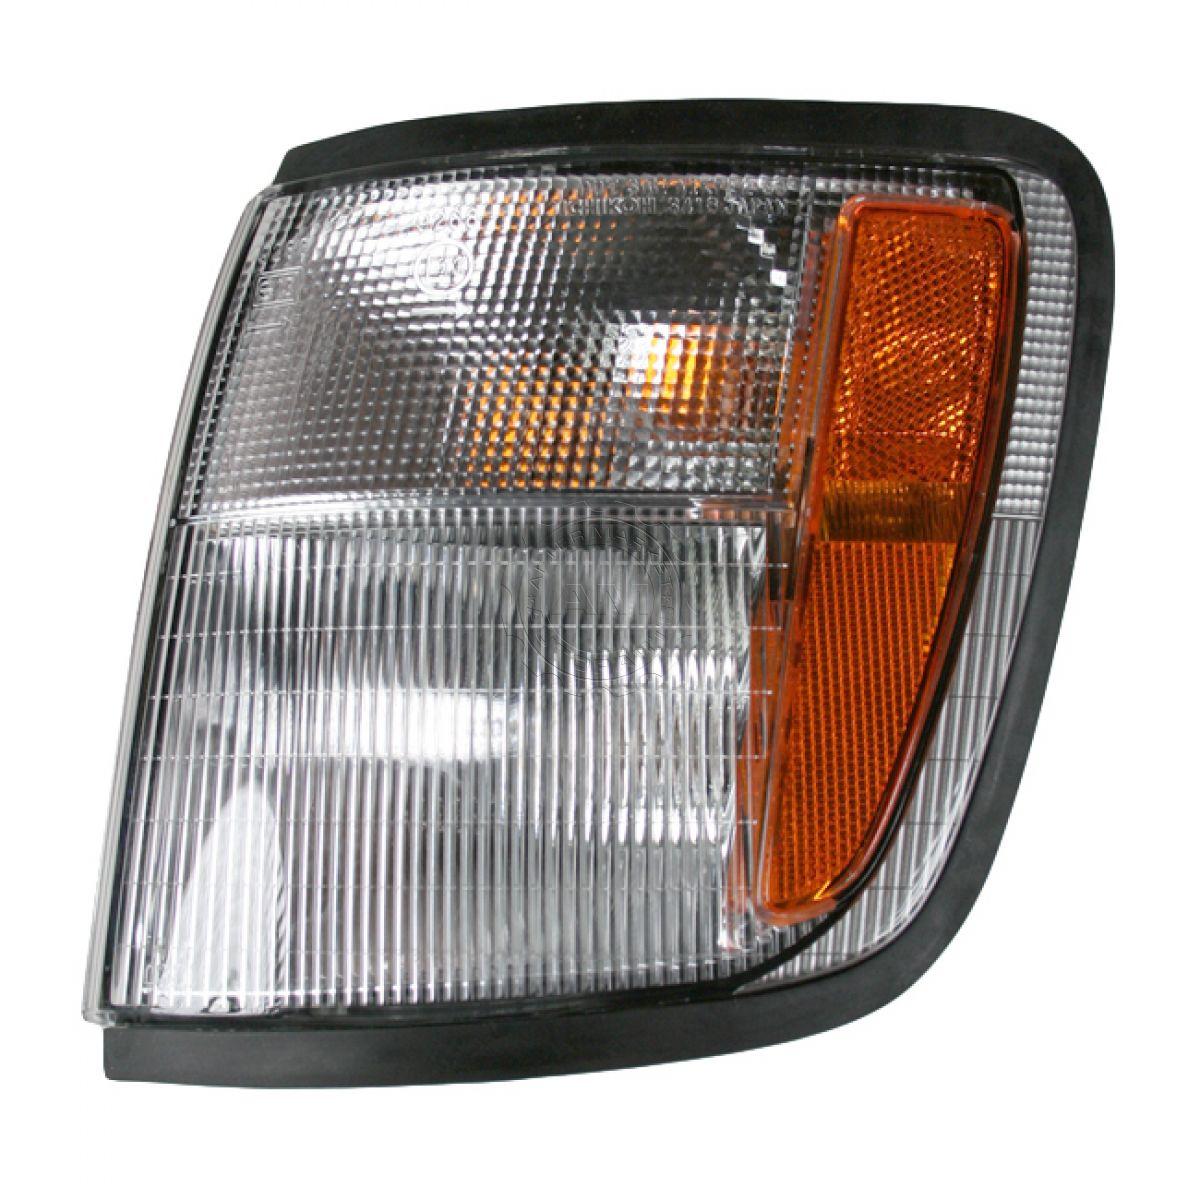 Signal Light LH Left for 98-99 Acura SLX 1998-2002 Isuzu Trooper